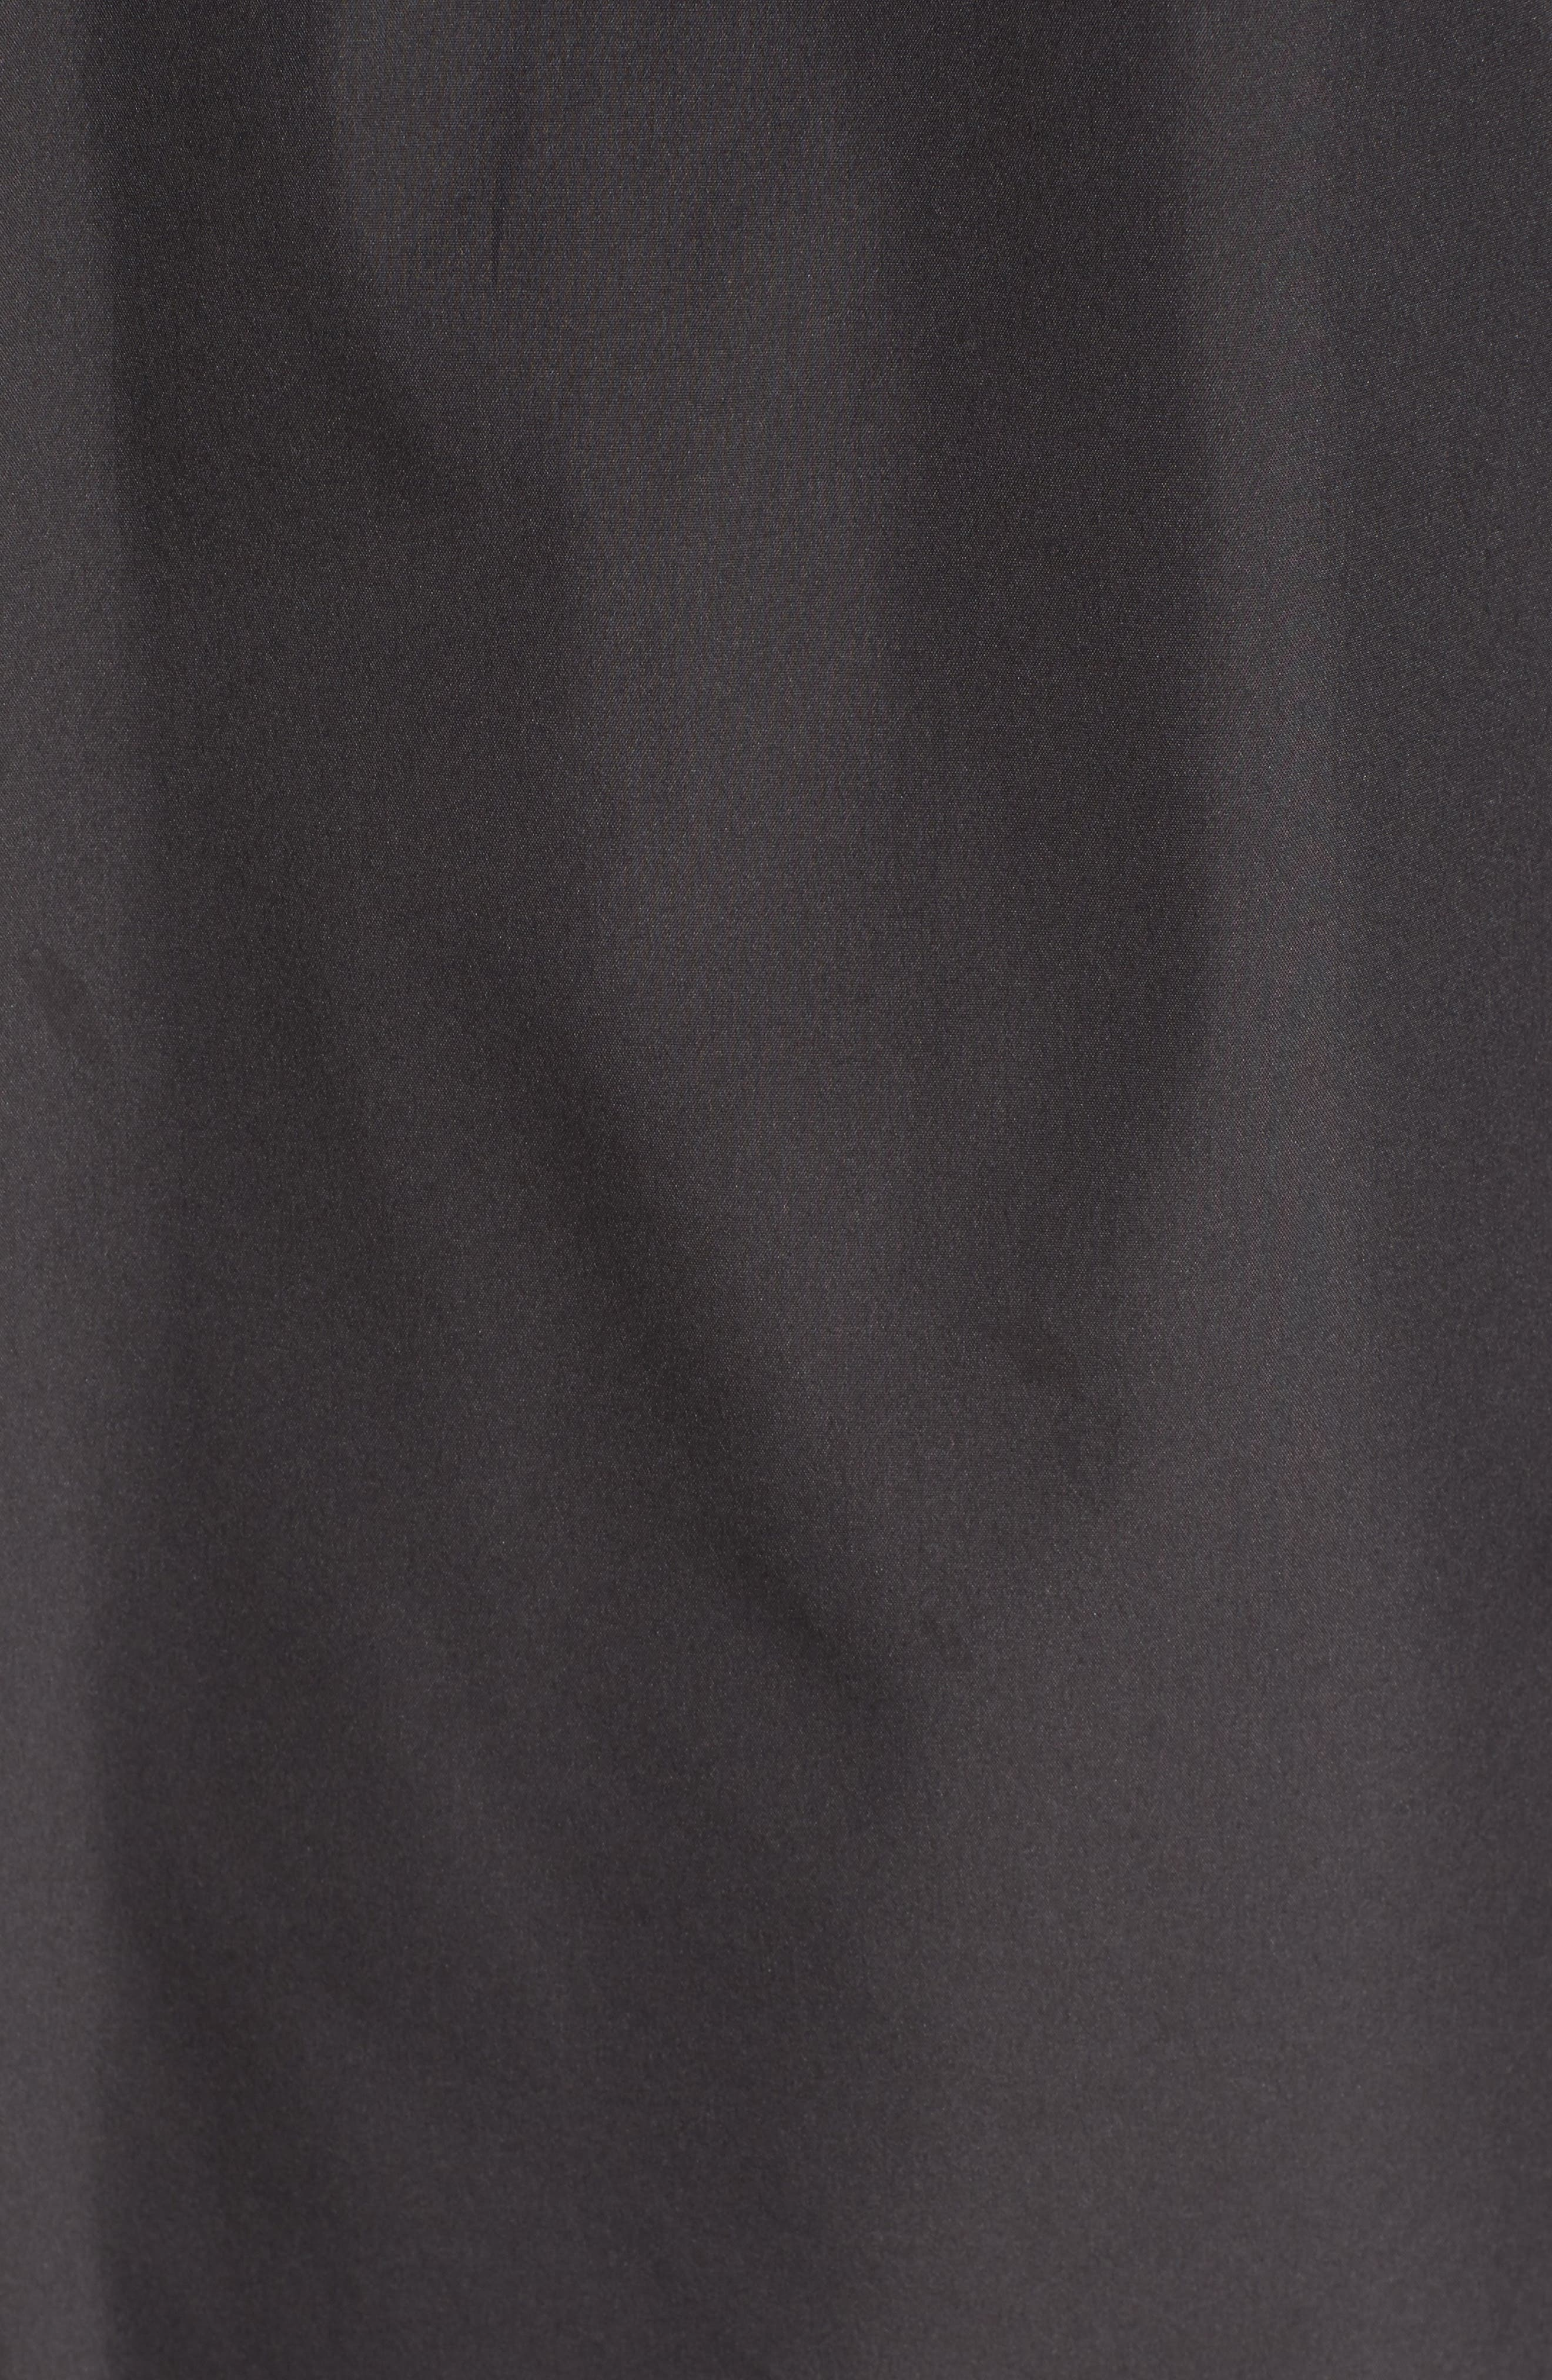 Hooded Jacket with Inset Fleece Bib,                             Alternate thumbnail 22, color,